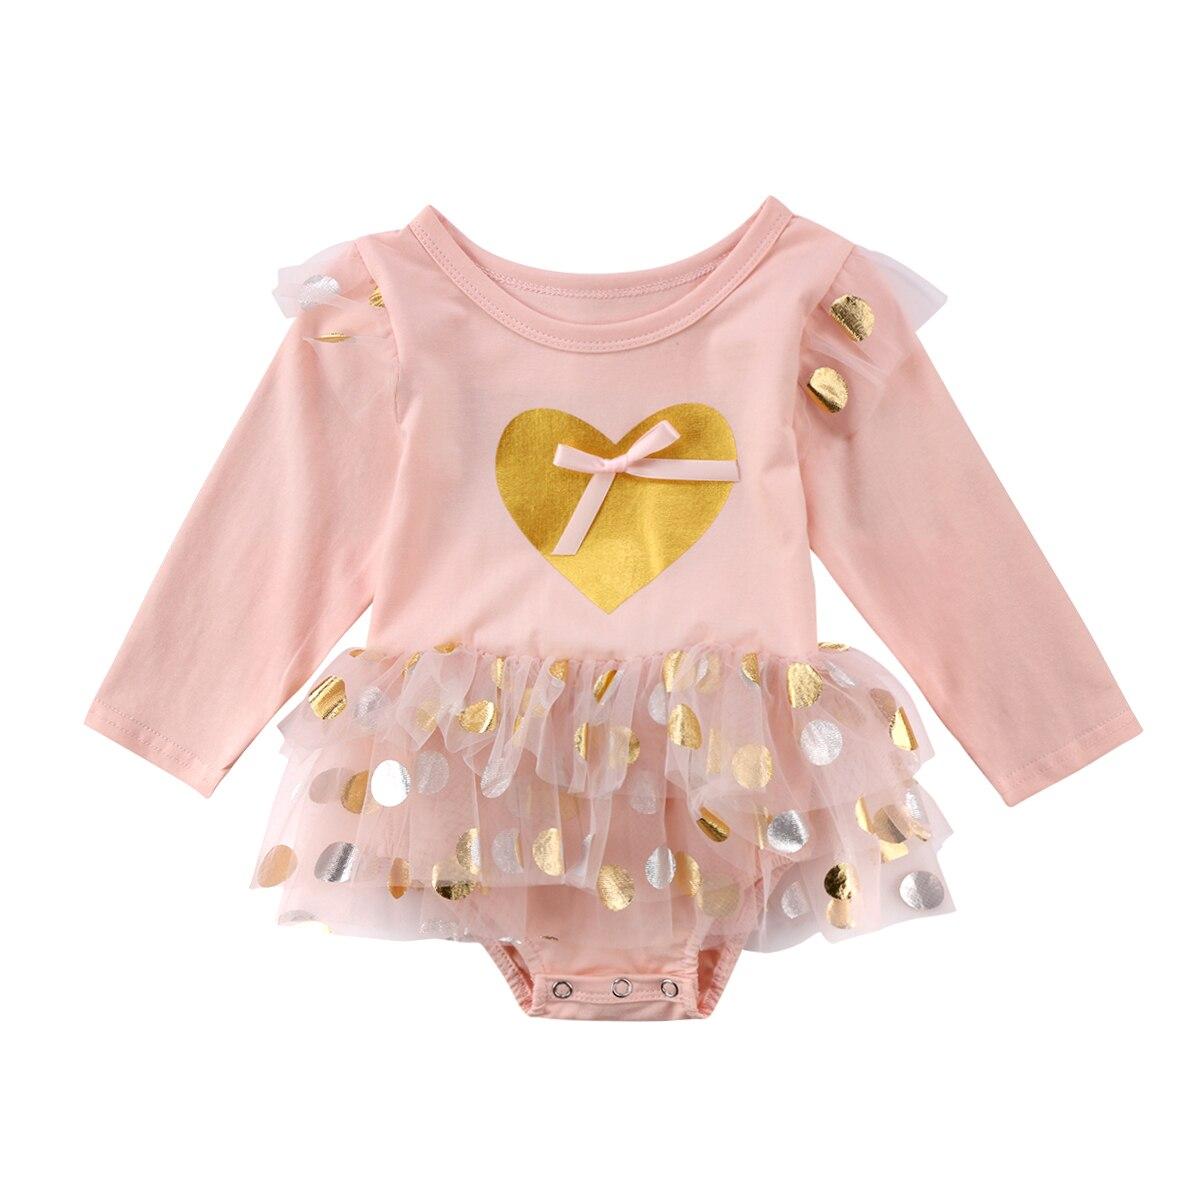 0-18M recién nacido niña conjuntos de manga larga 2018 lentejuelas corazón body Tutu falda Rosa ropa